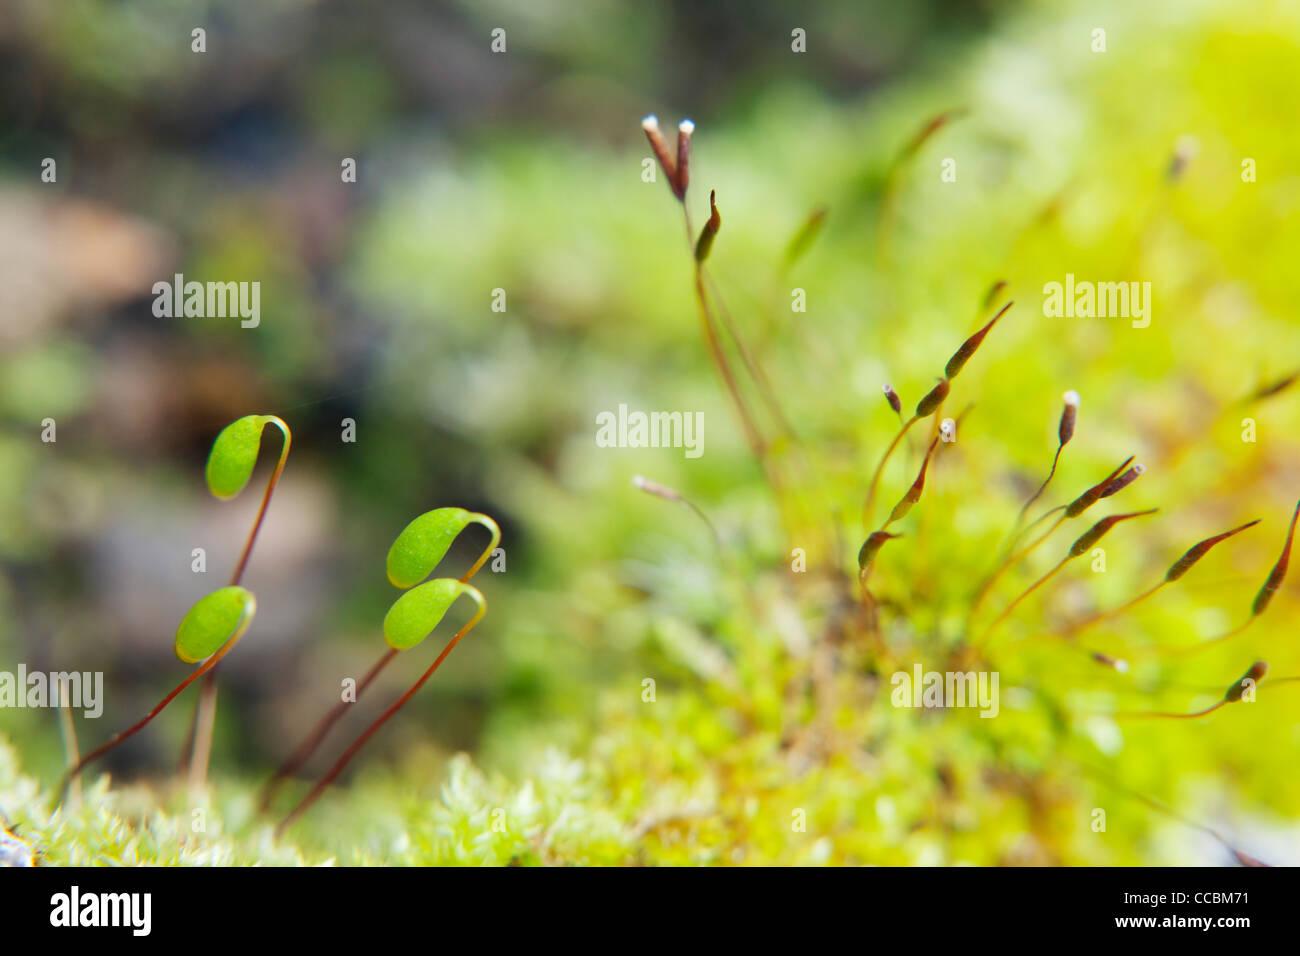 Fabelhaft Moossporen Stockfotos & Moossporen Bilder - Alamy #BC_47